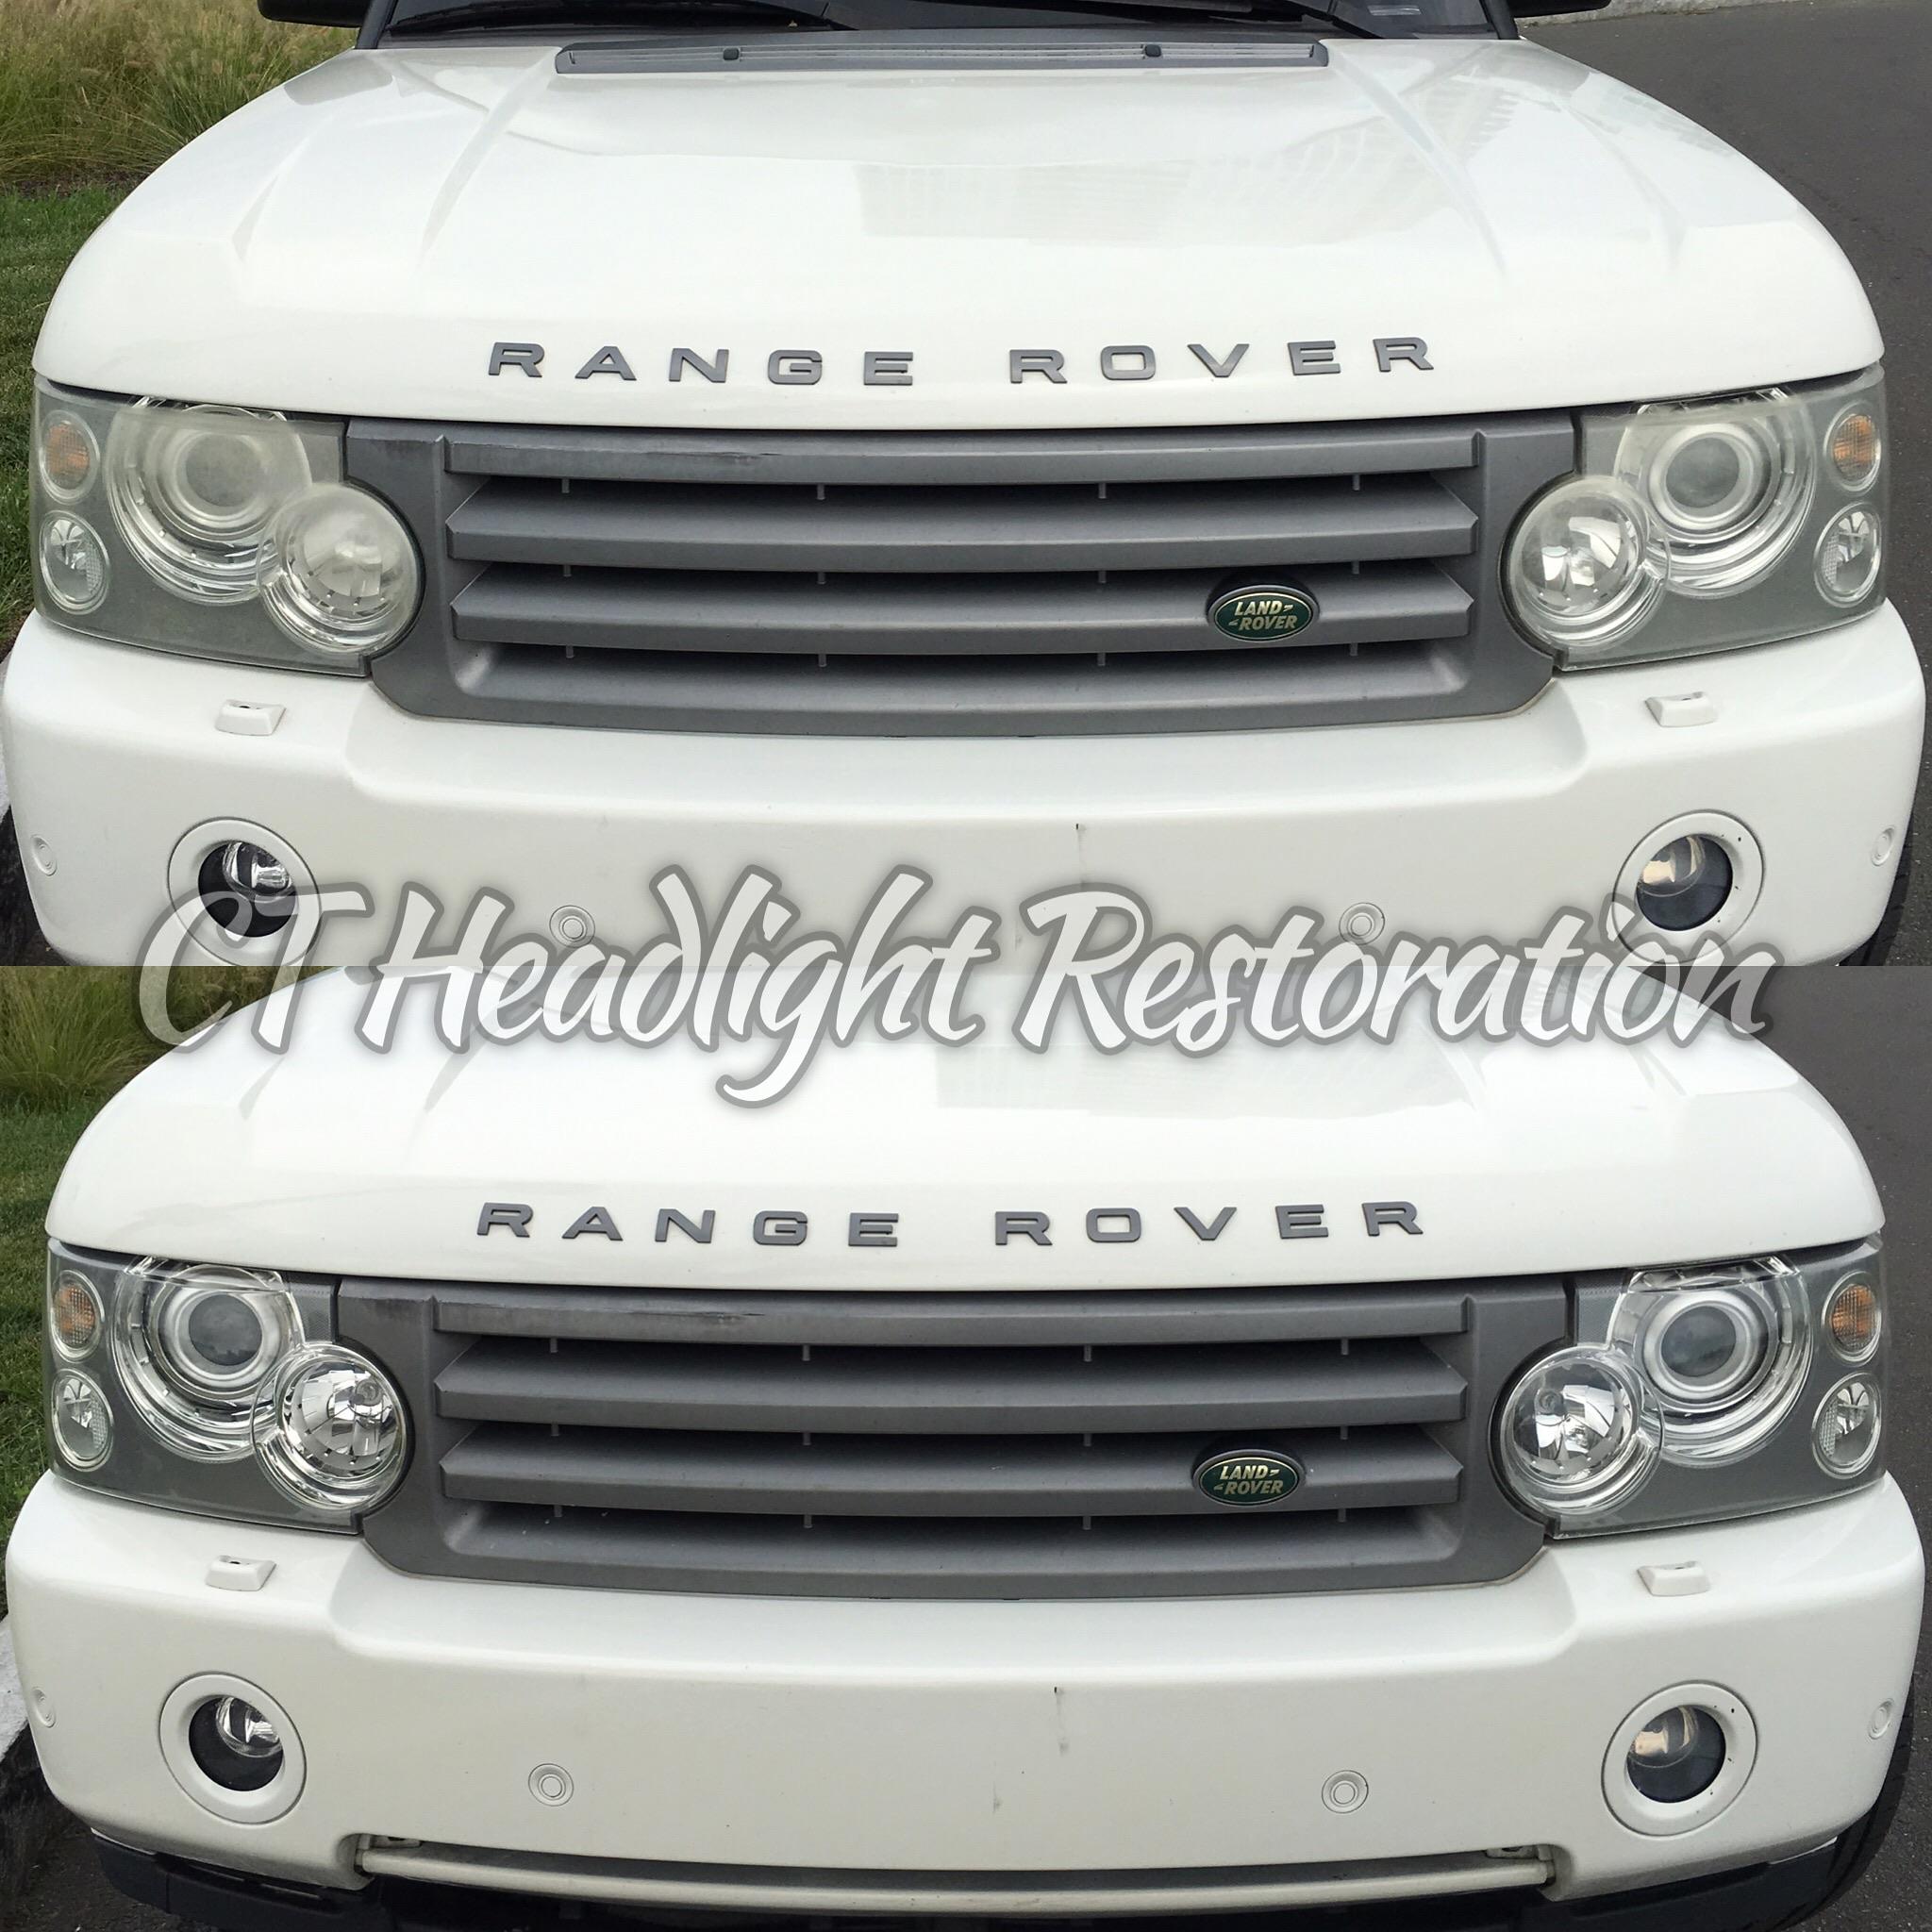 Range Rover Headlight Clear Restoration.jpg